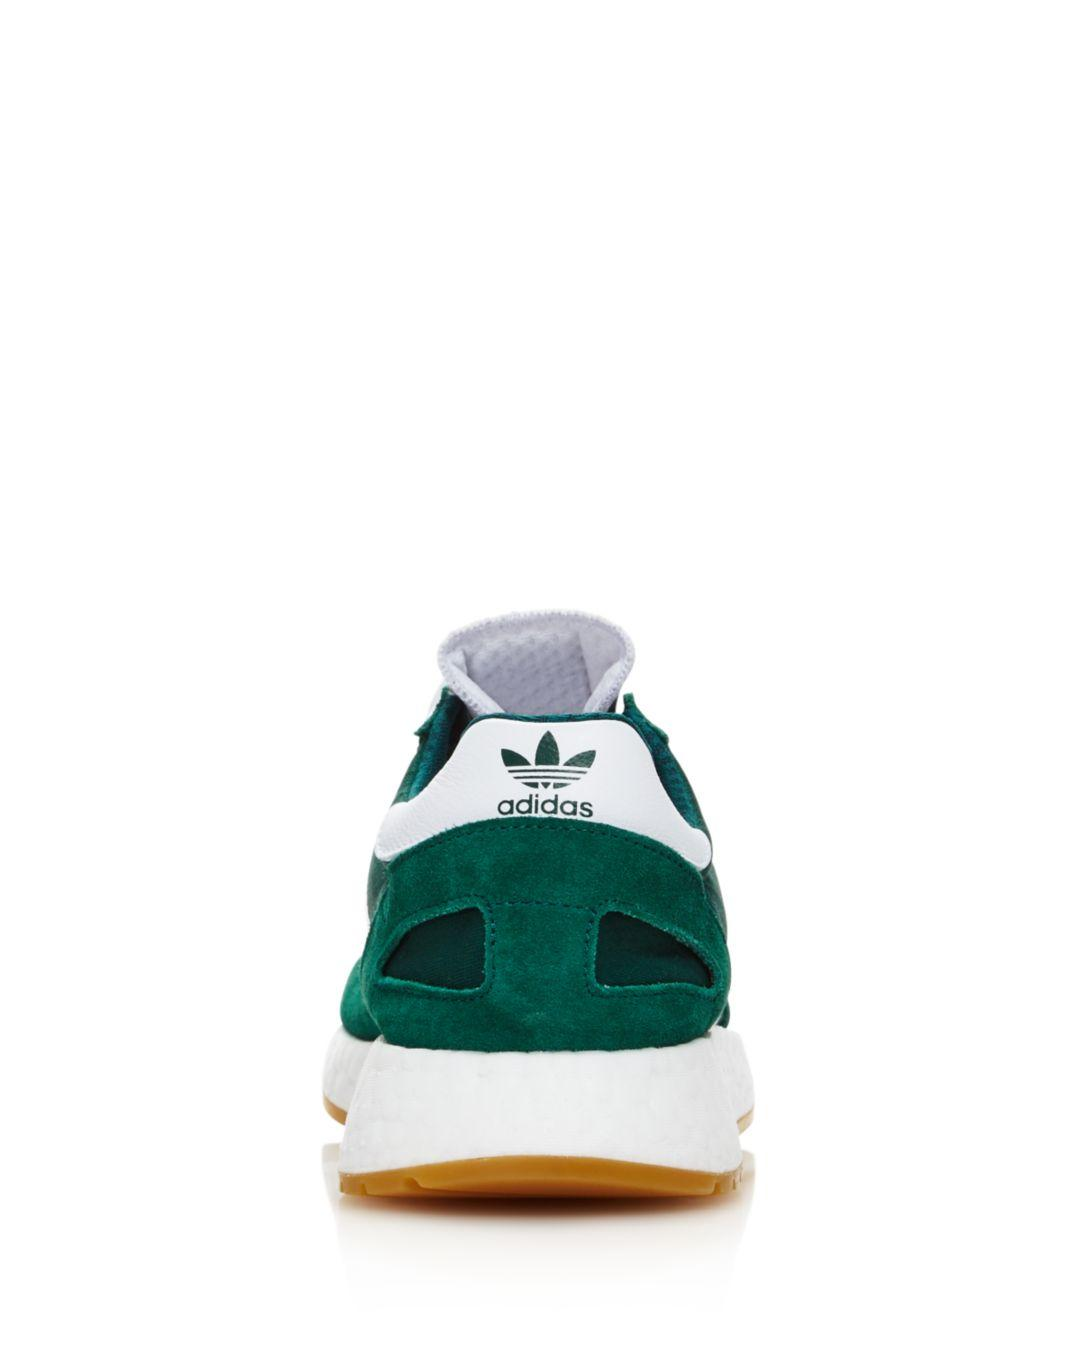 I - 5923 Low - Top Sneakers